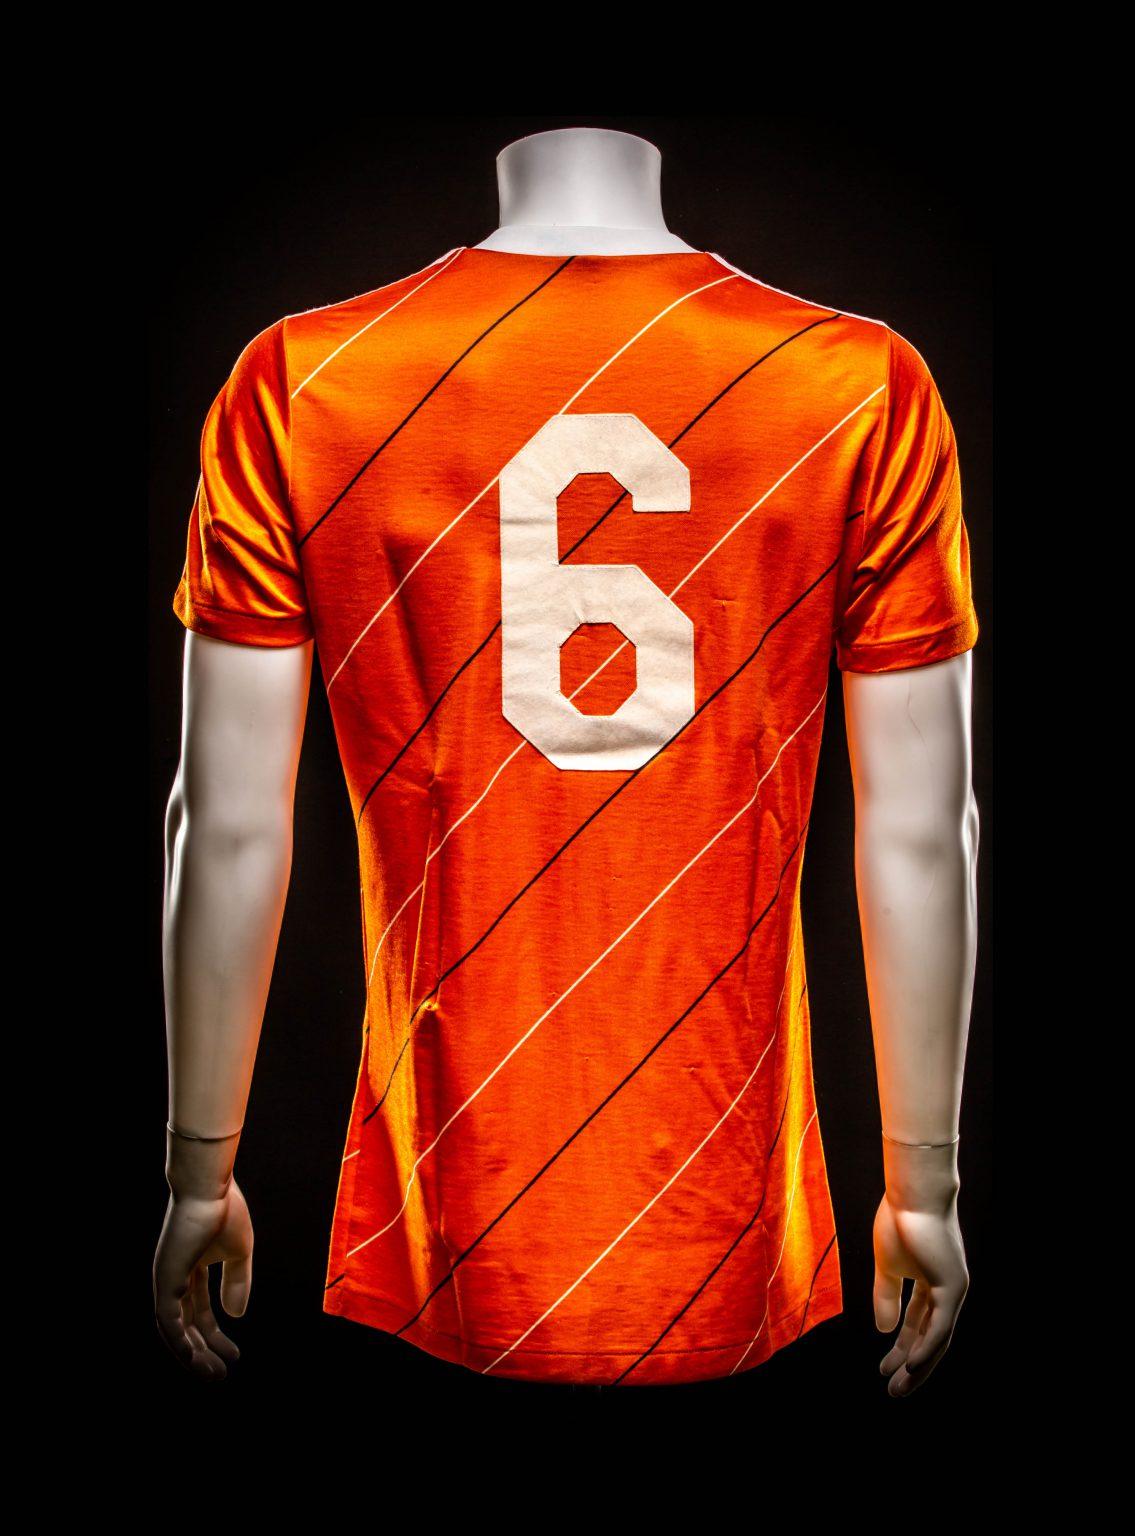 #6 Jong Oranje Martin Laamers